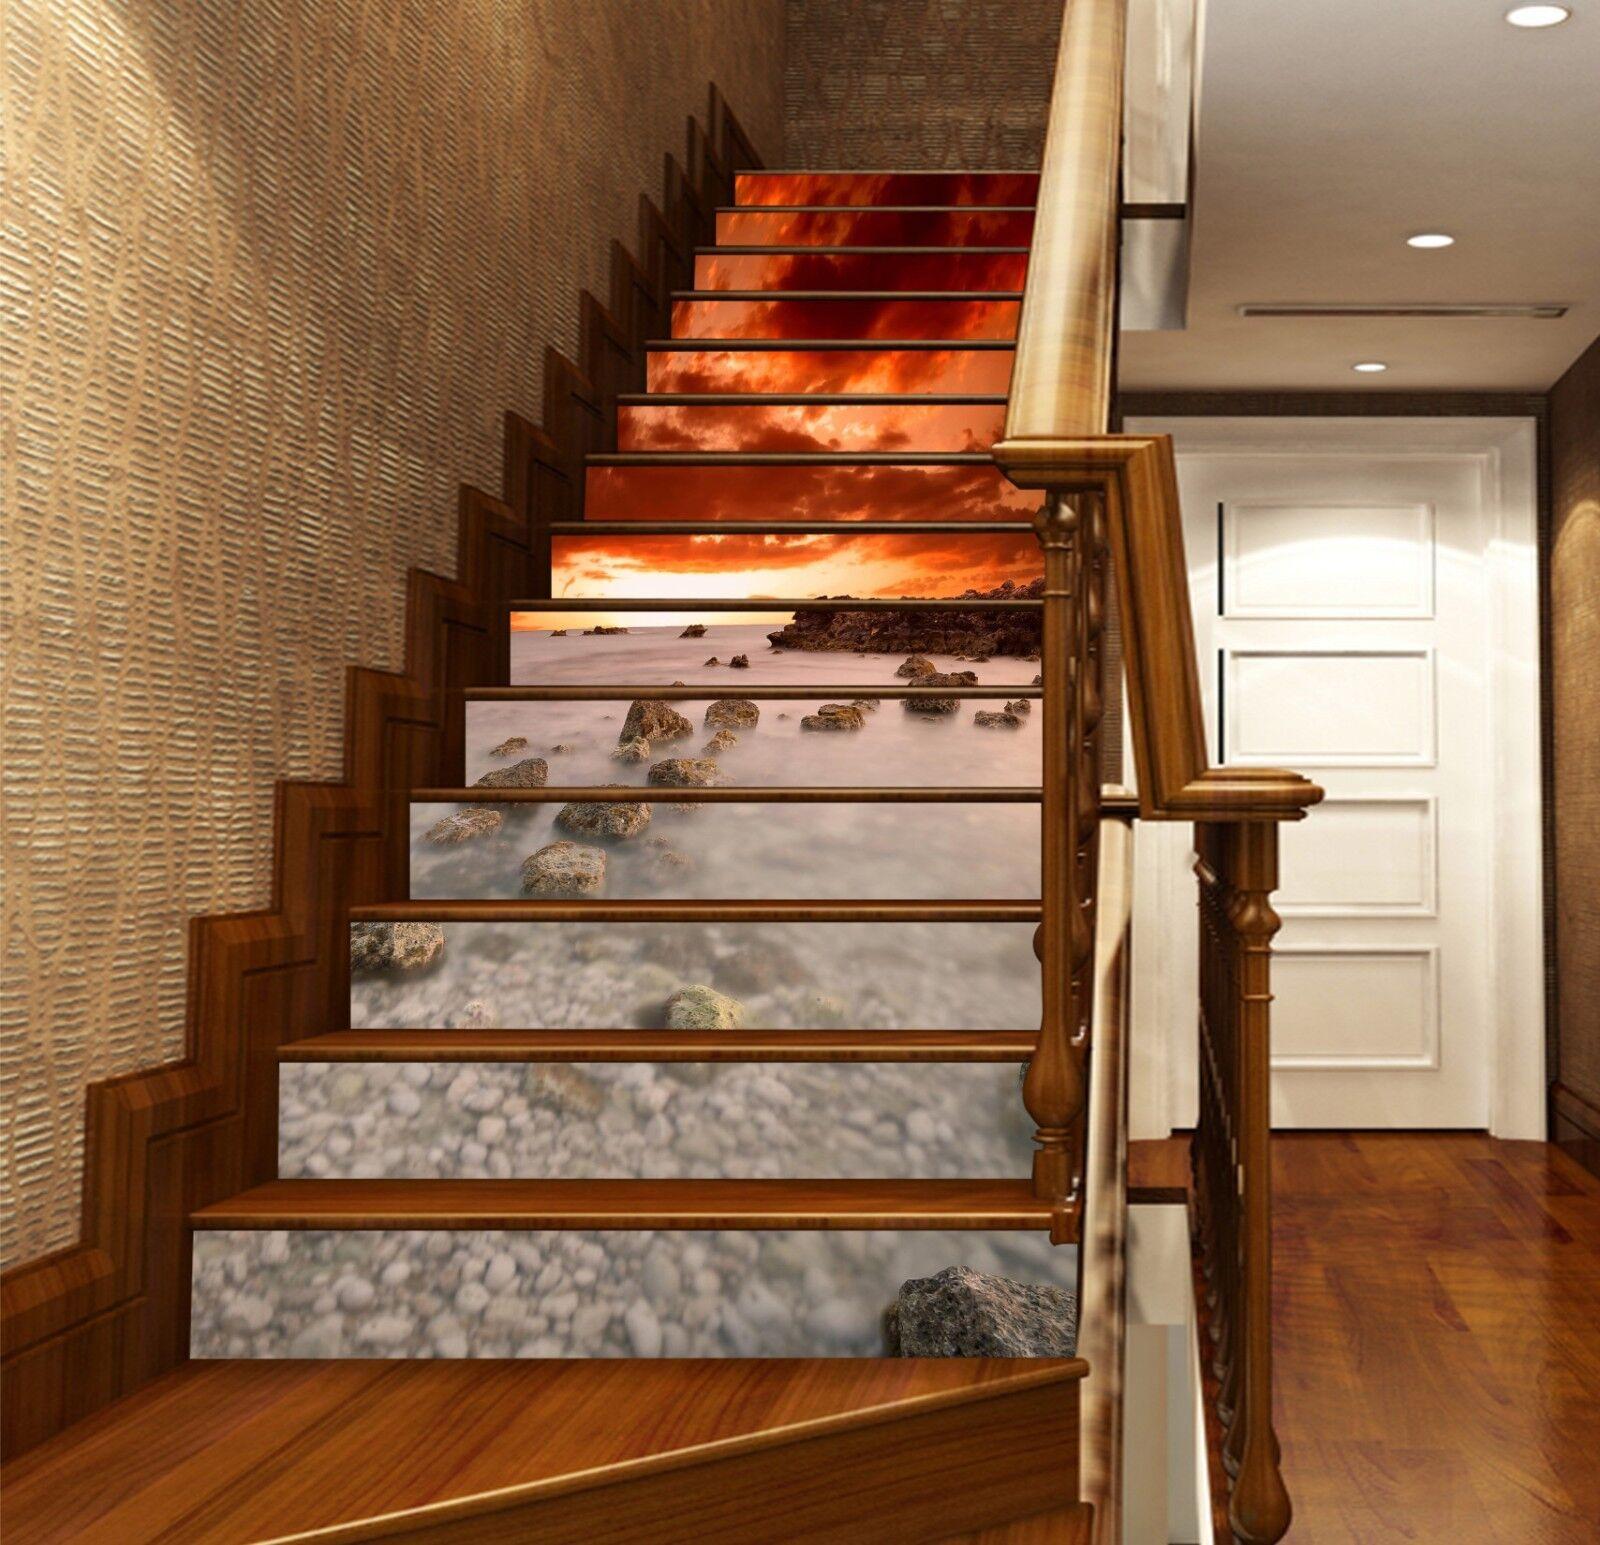 3D Sky Sea 35 Stair Risers Decoration Photo Mural Vinyl Decal Wallpaper UK